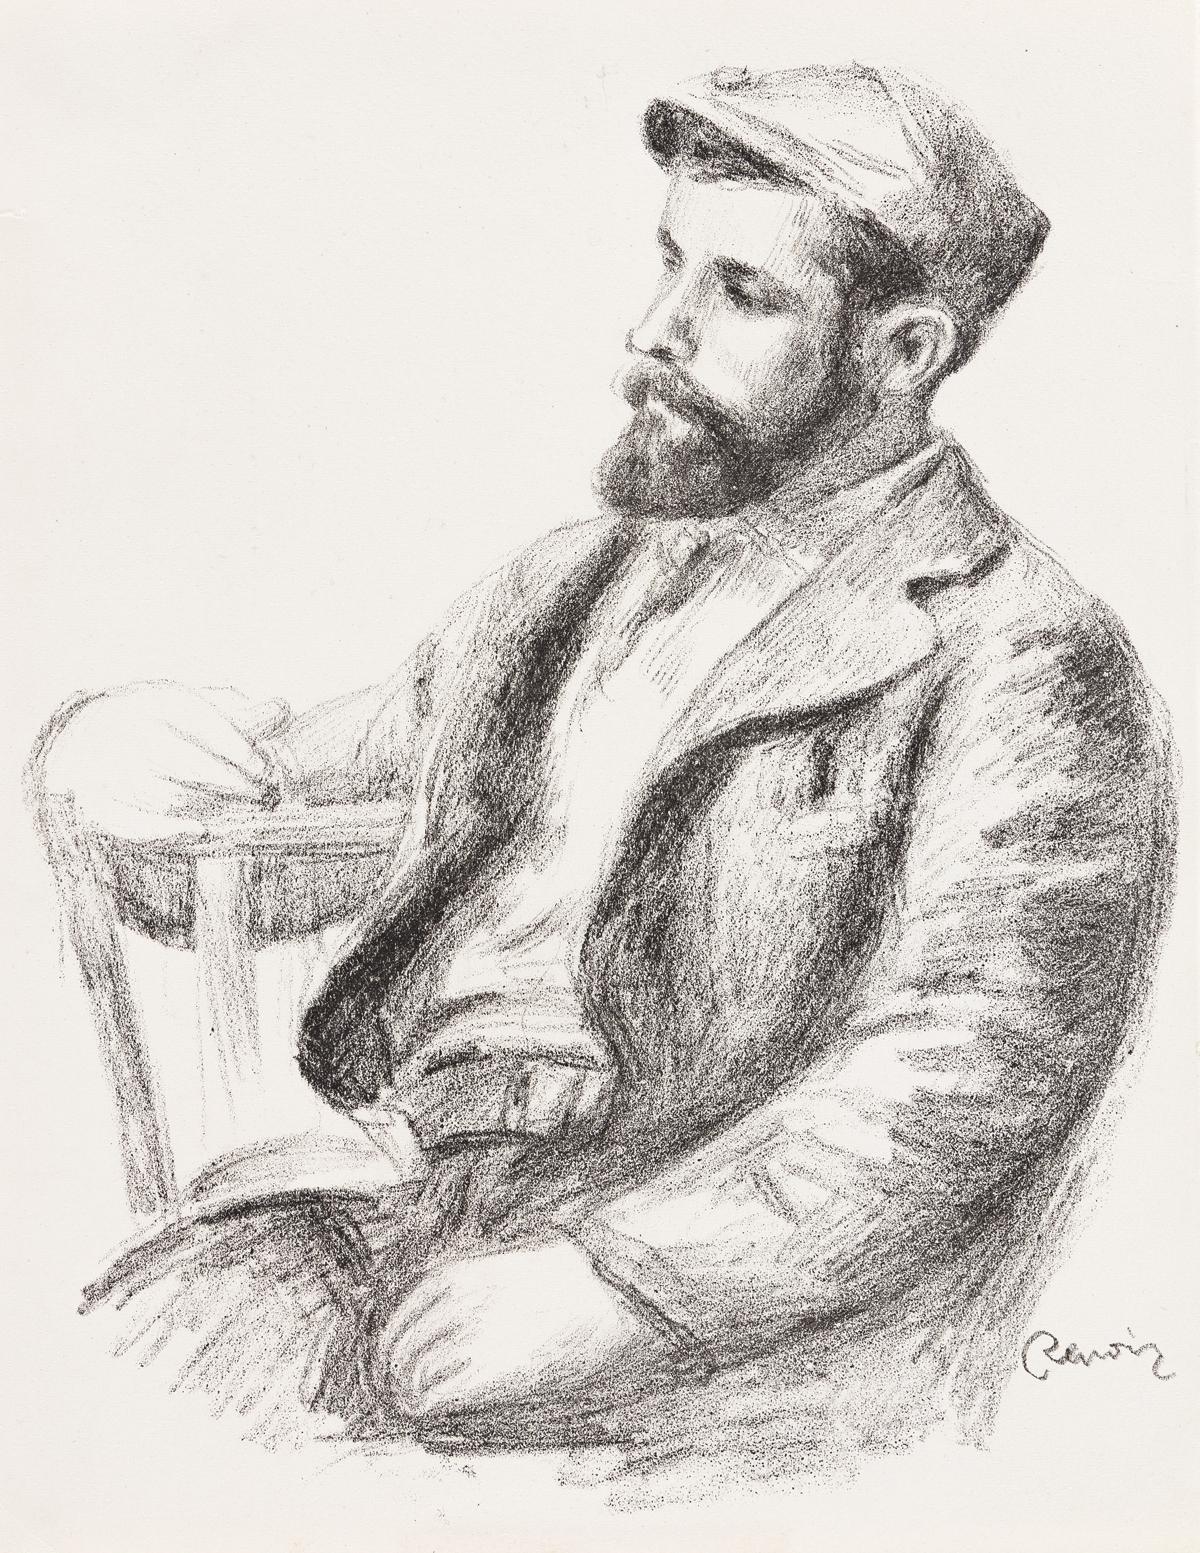 PIERRE-AUGUSTE RENOIR Louis Valtat.